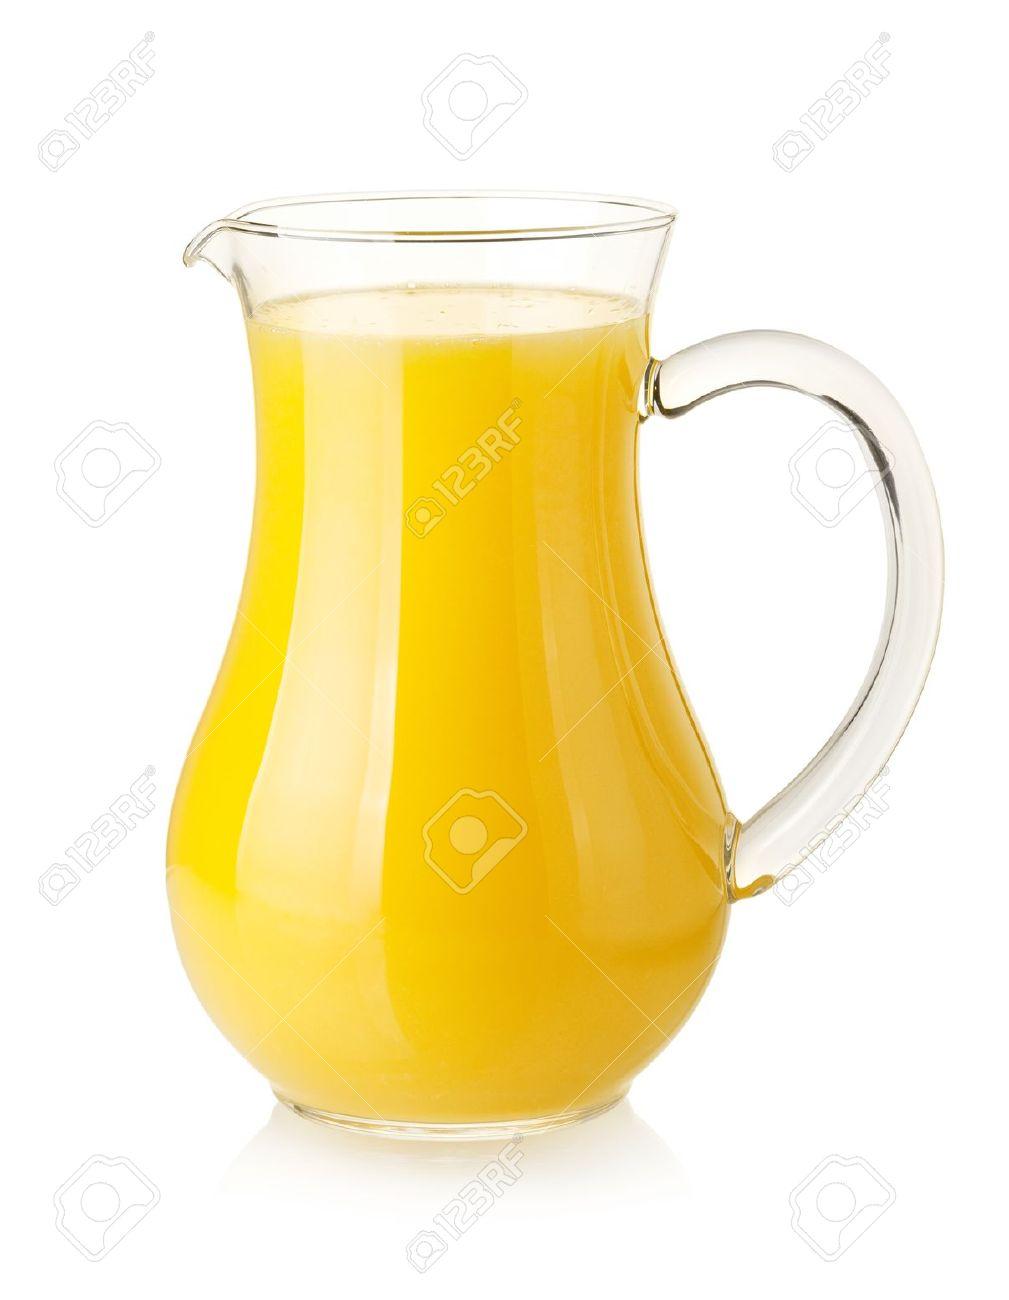 Orange juice in pitcher. Isolated on white background Stock Photo - 9559969